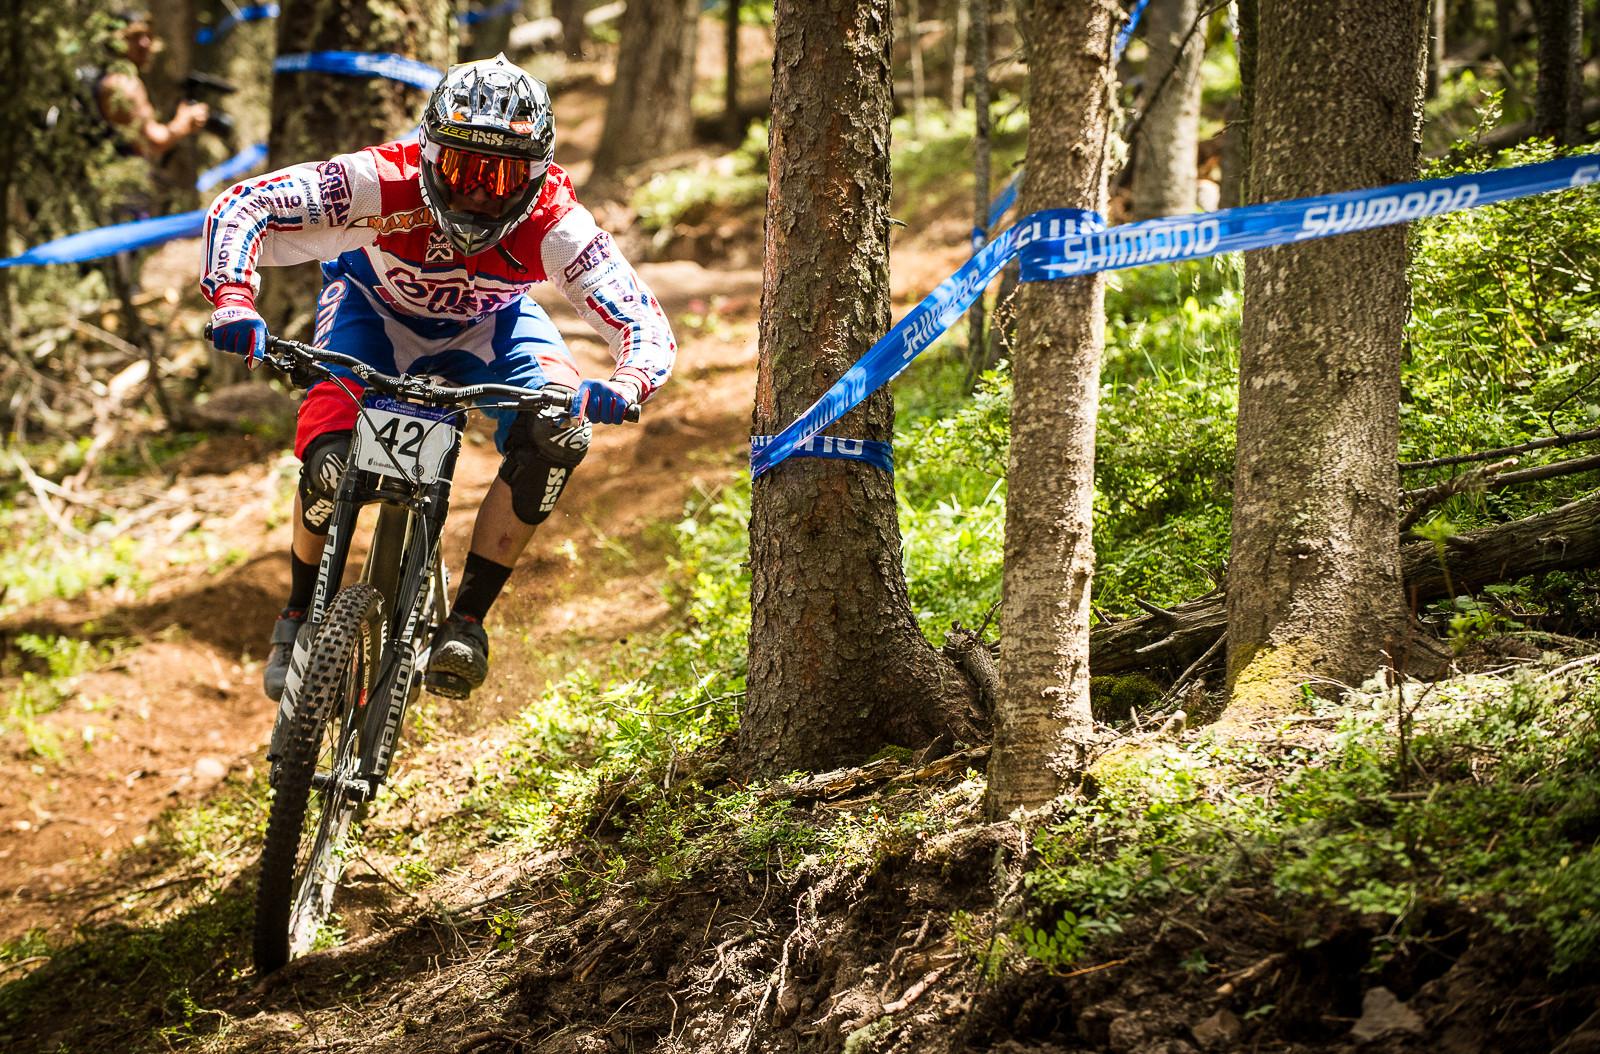 Logan Binggeli, 2nd Place, U.S. National Championships DH - U.S. National Championship Downhill Finals Photos - Mountain Biking Pictures - Vital MTB